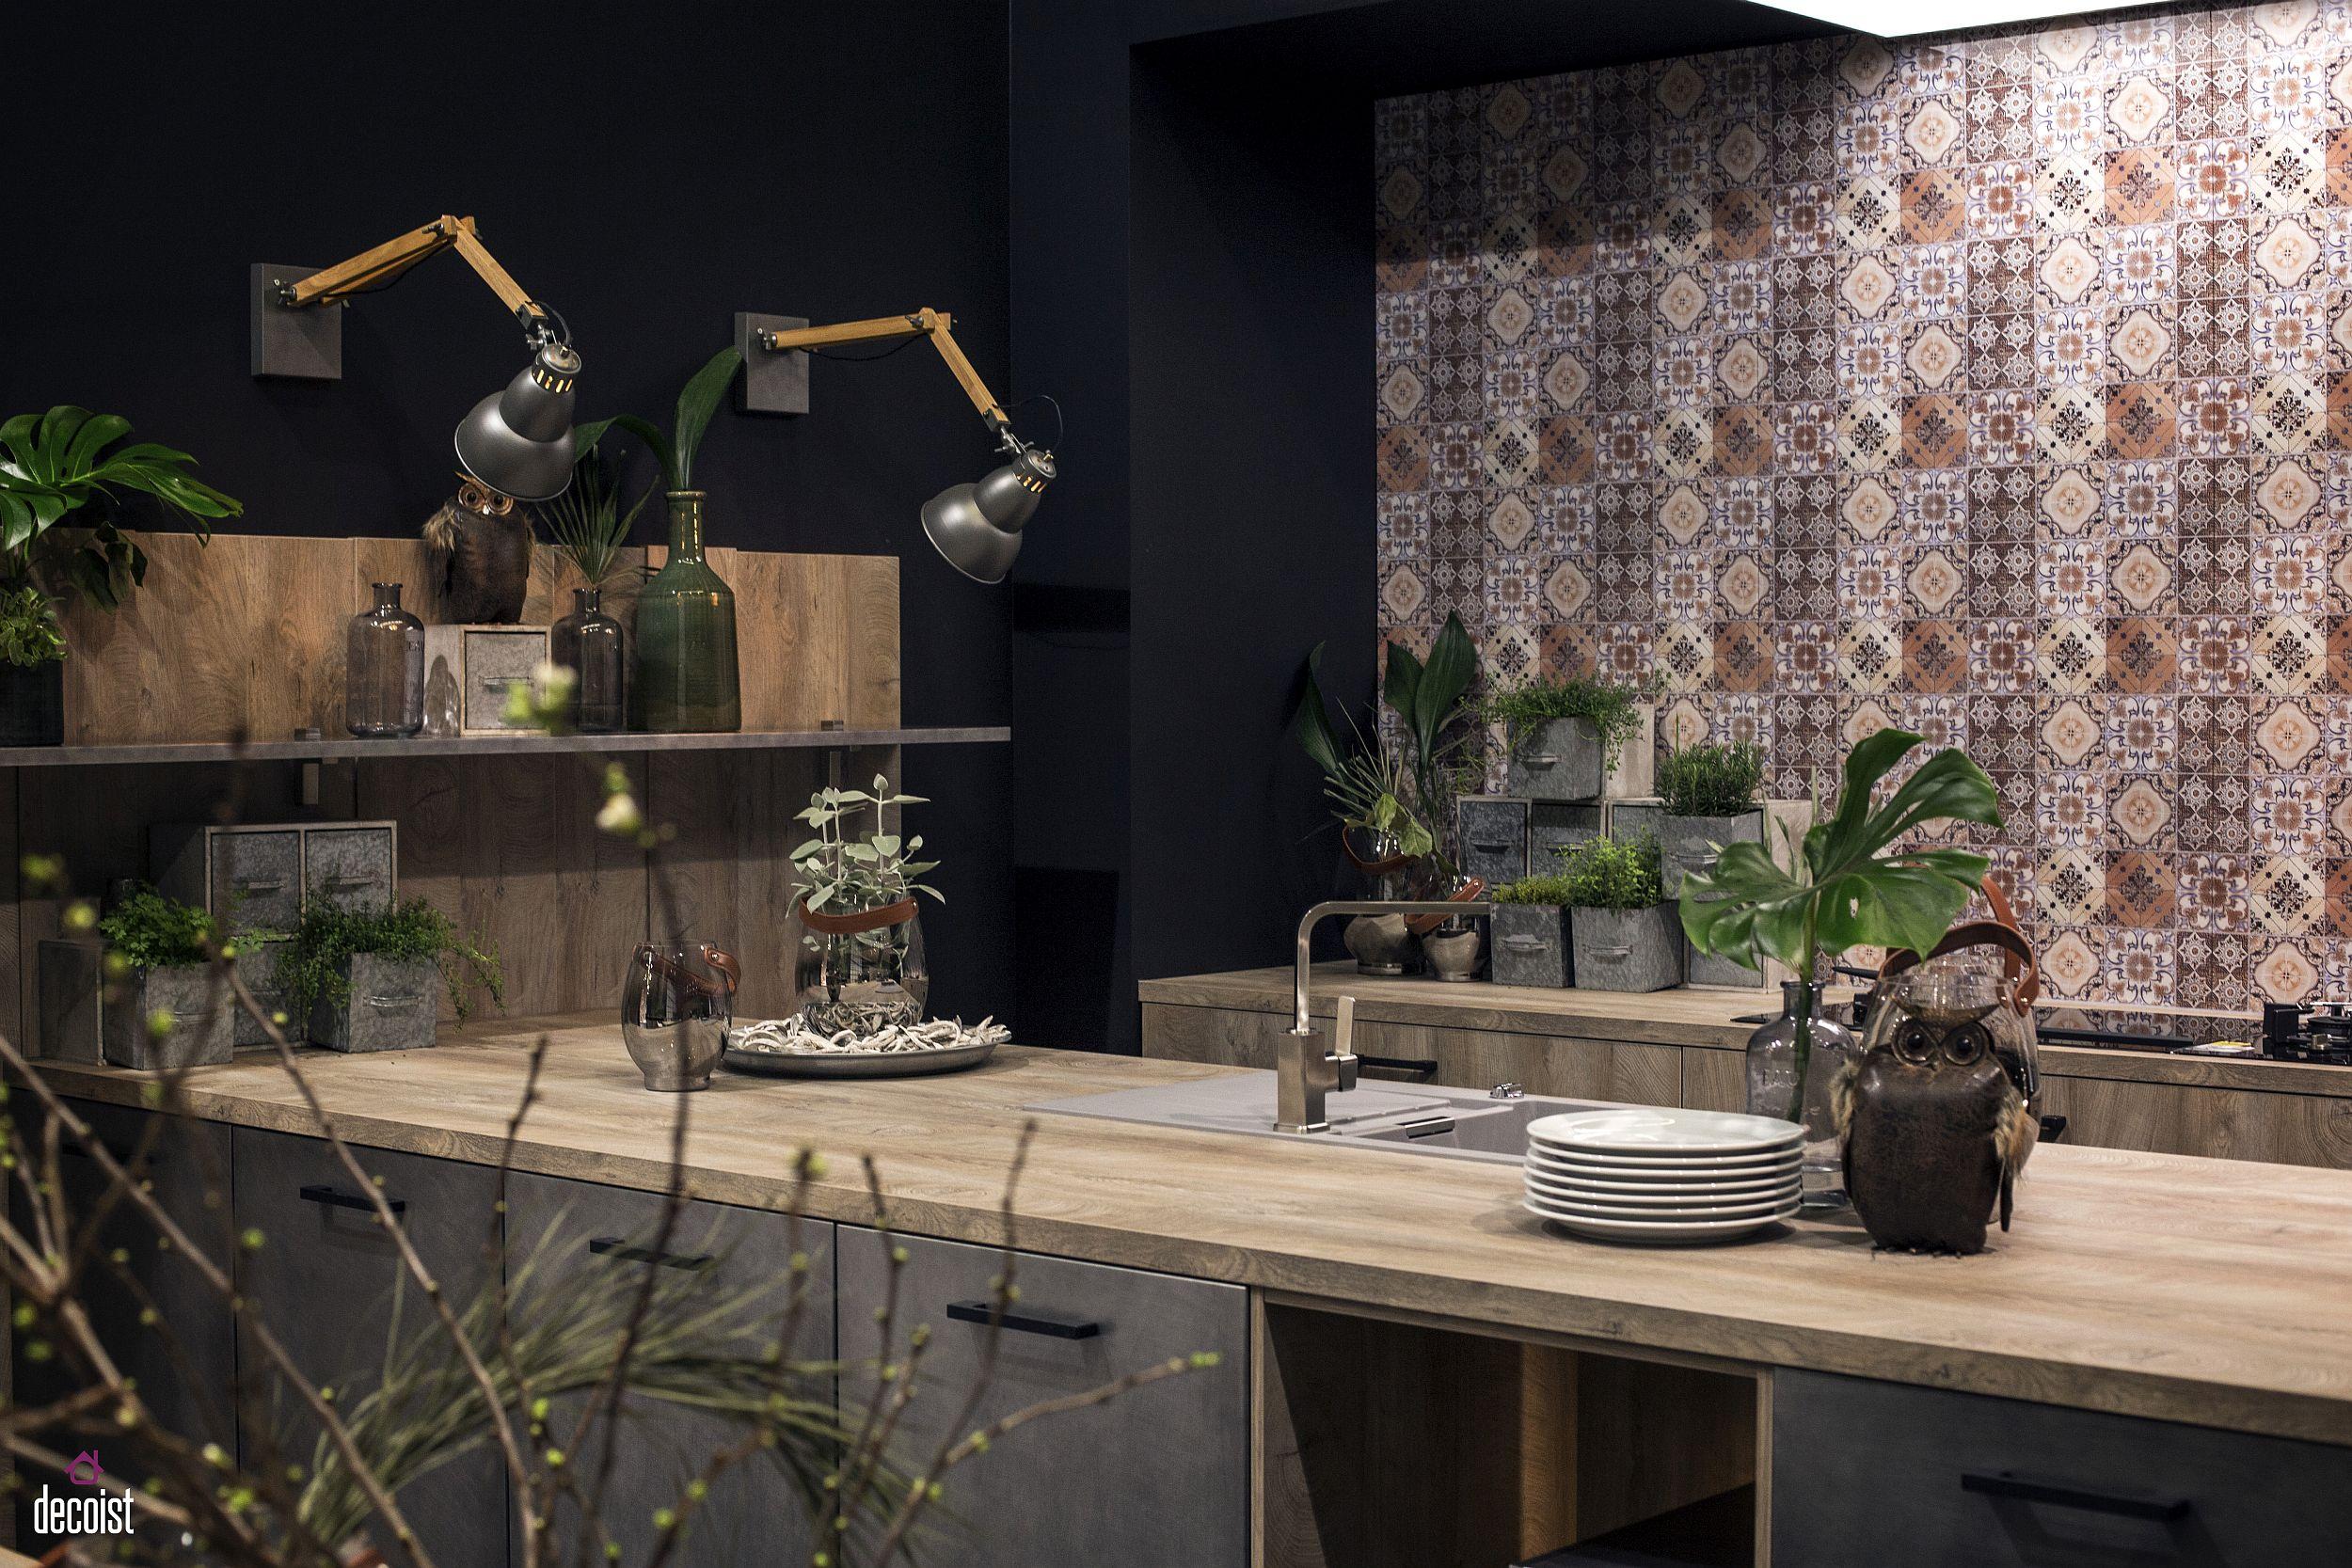 Industrial-style-sconce-light-illuminate-the-dashing-kitchen-shelf